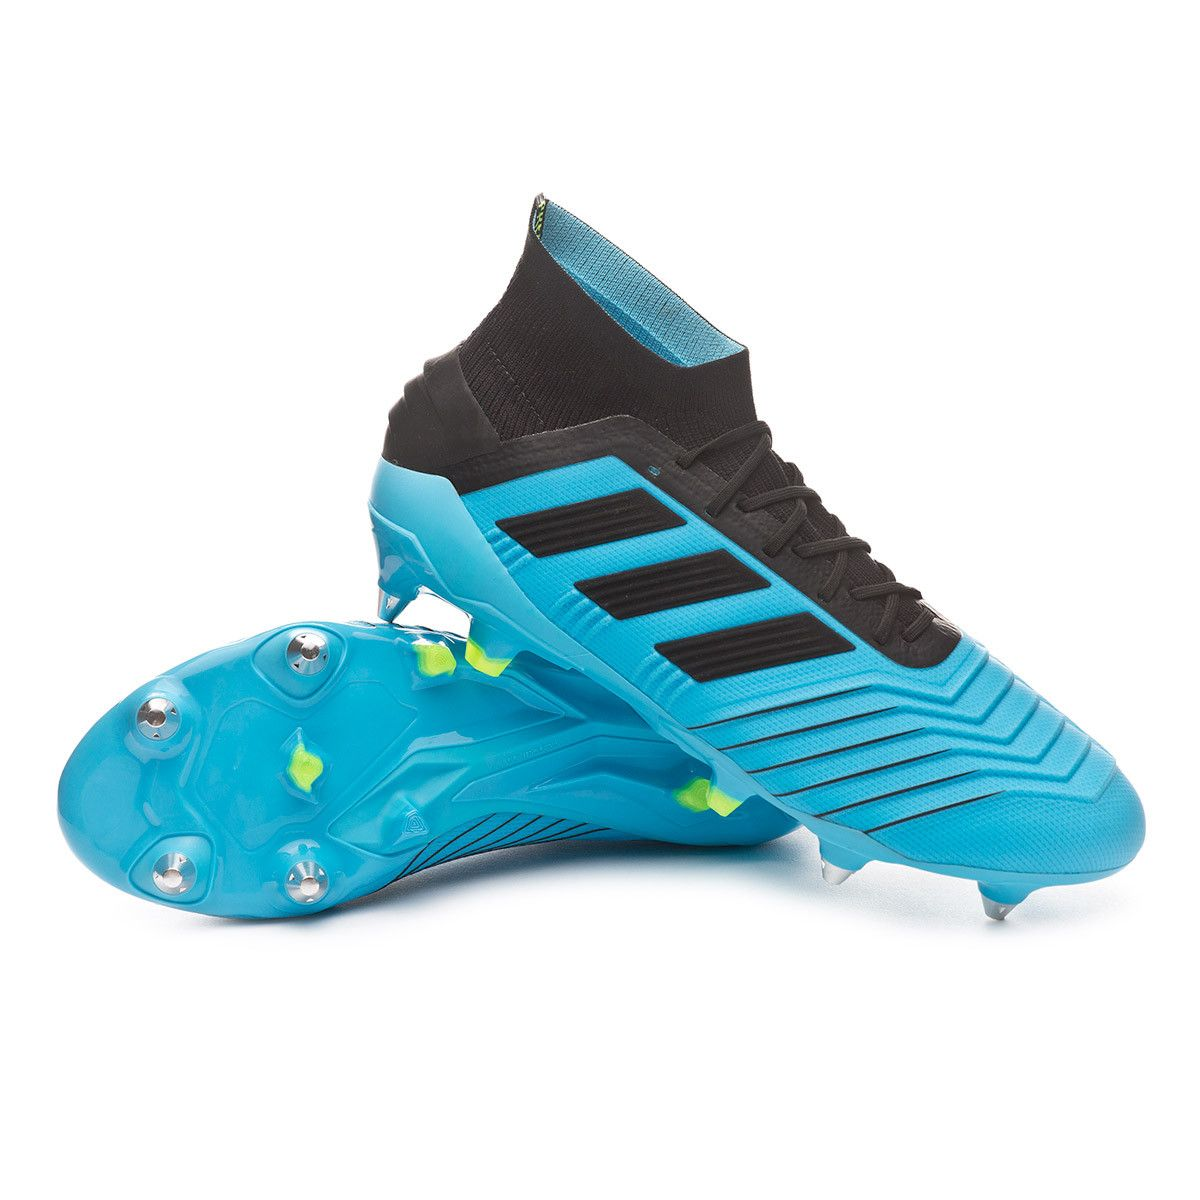 Football Boots Adidas In 2020 Football Boots Boots Black Football Boots